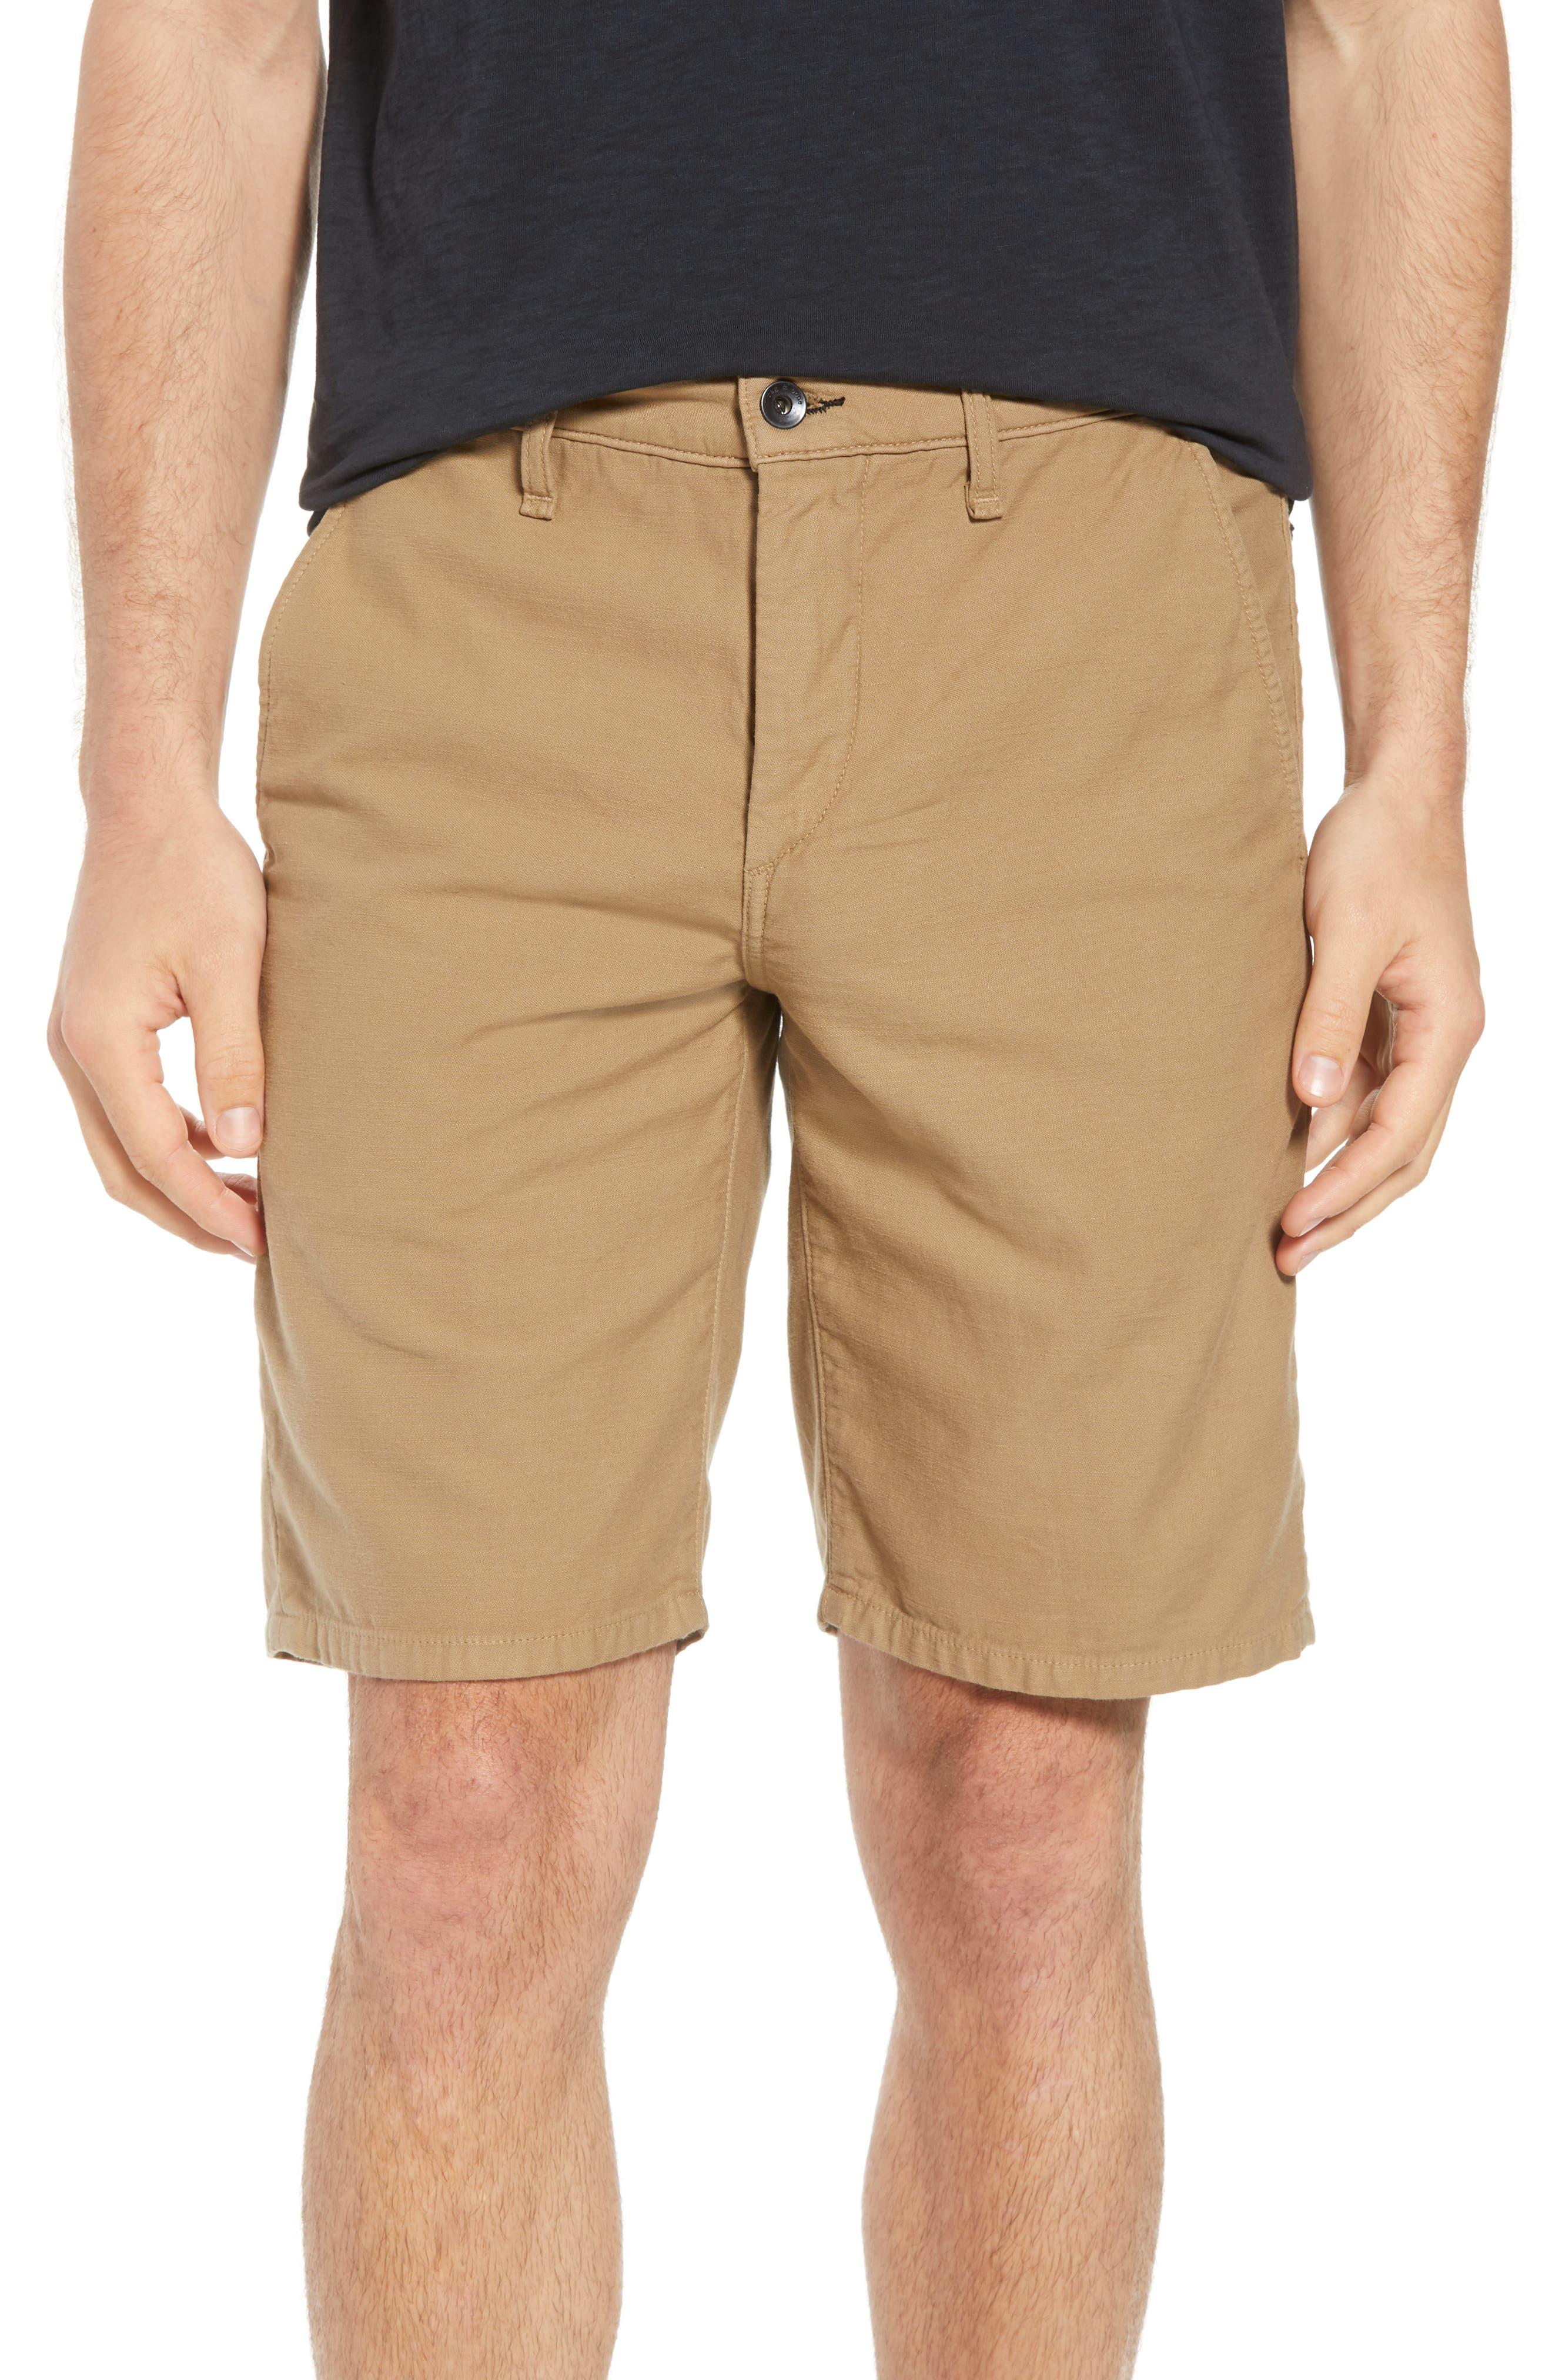 Straight Leg Chino Shorts,                             Main thumbnail 1, color,                             KHAKI